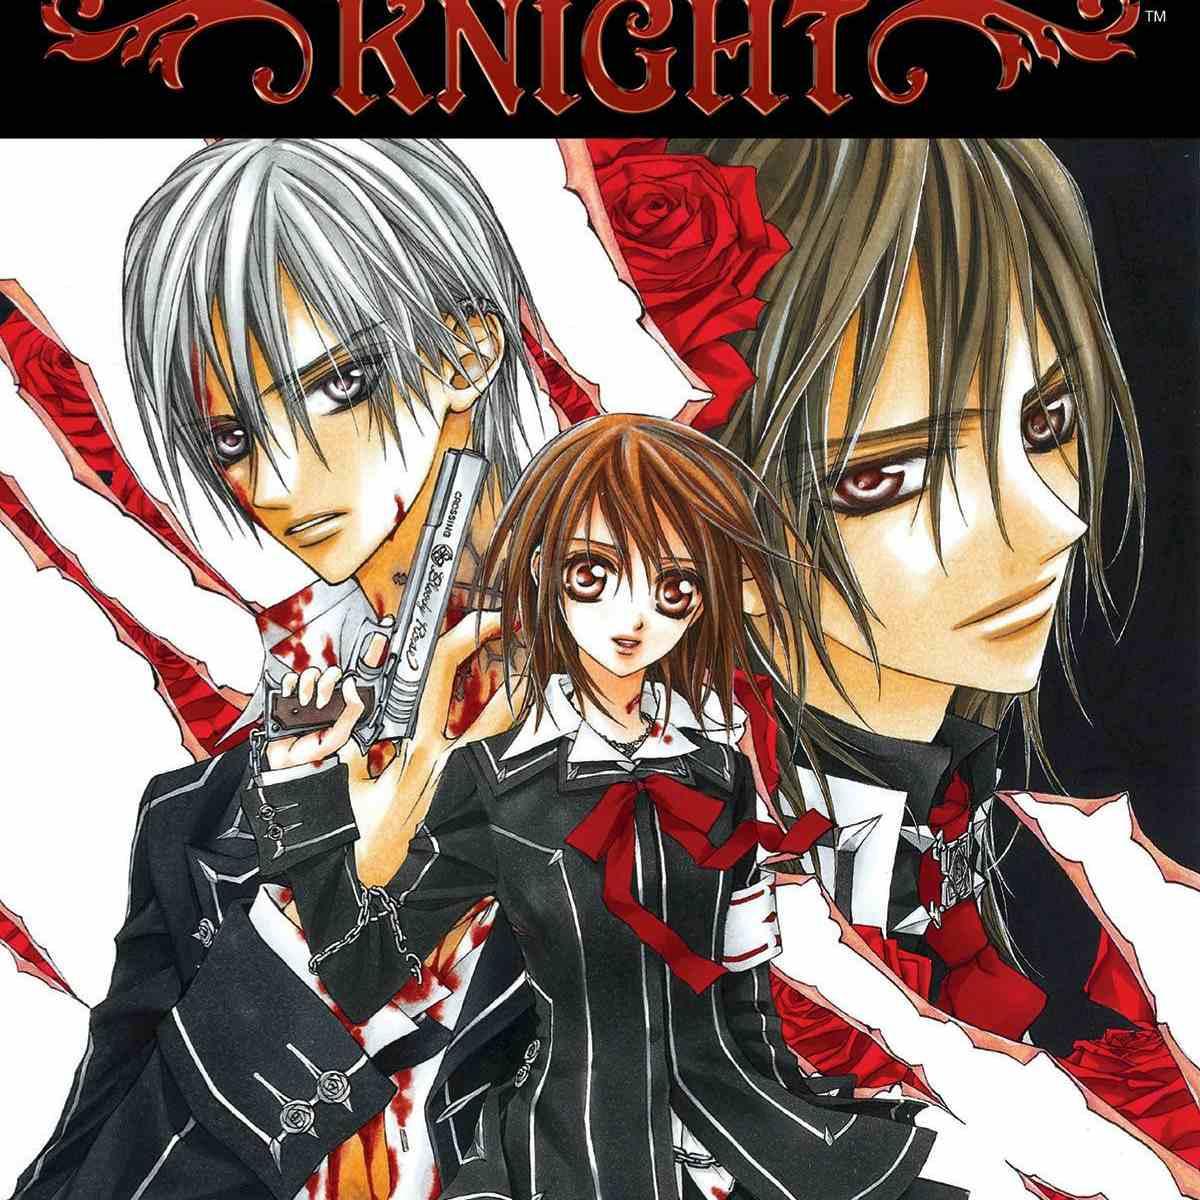 Vampire Knight Vol. 1 cover.